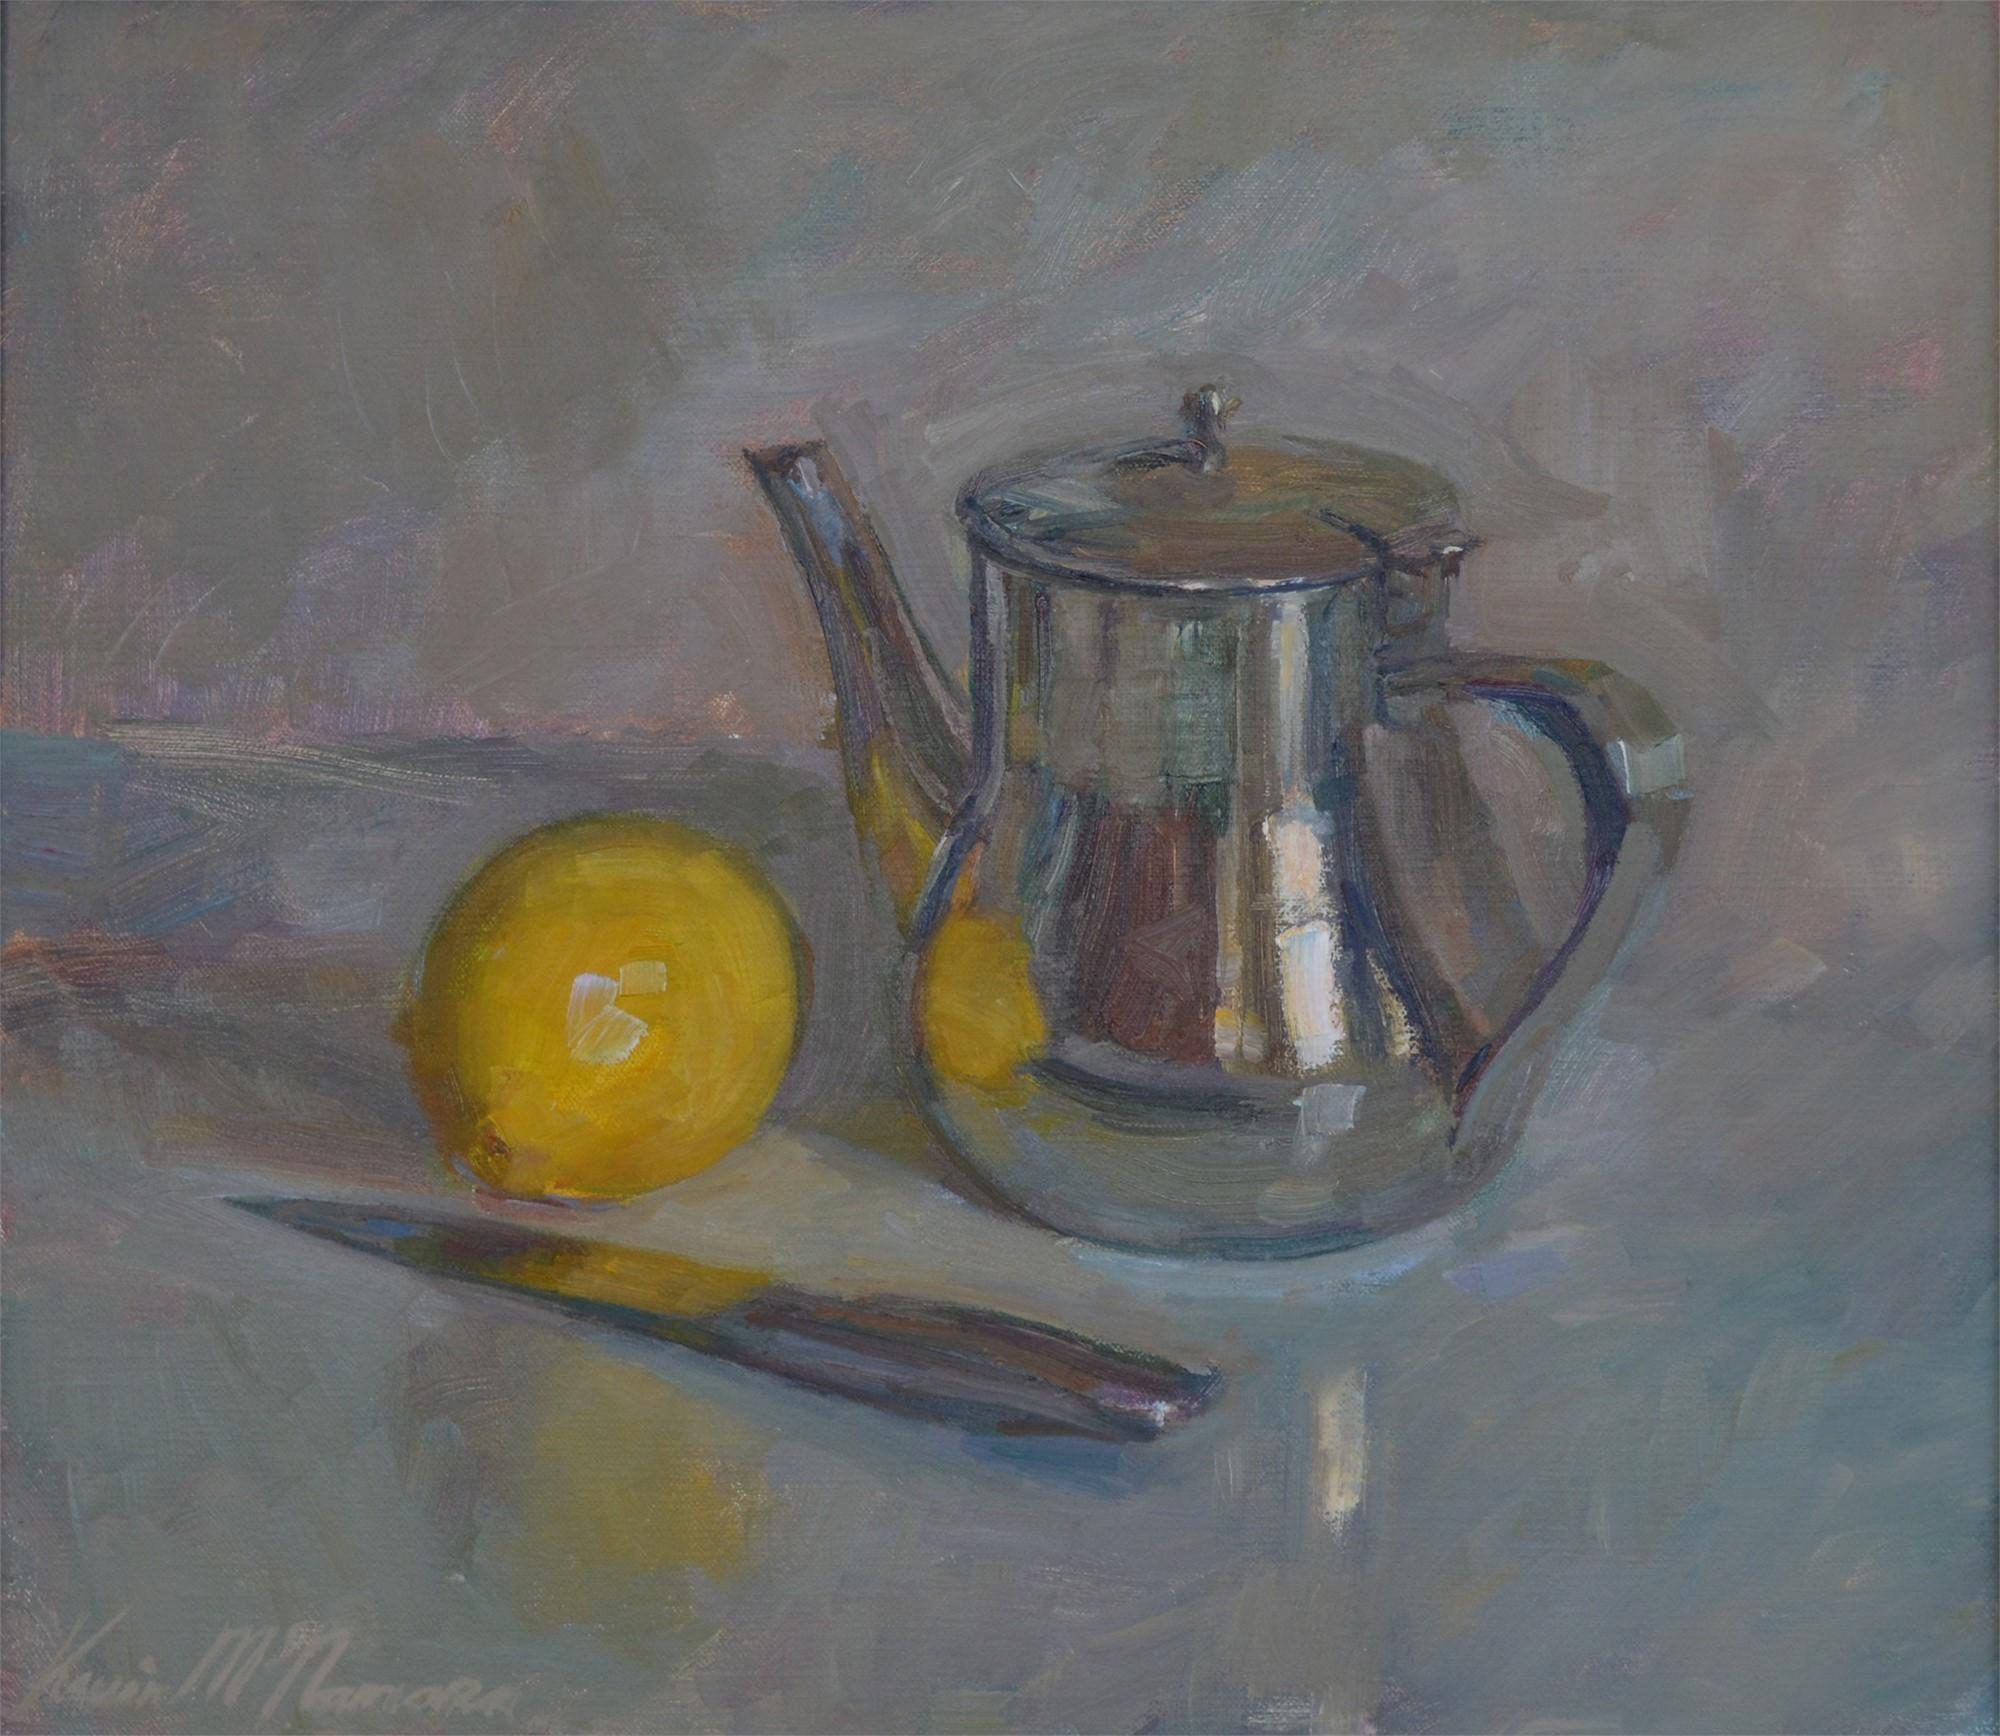 Still Life with Tea Pot and Lemon by Kevin McNamara